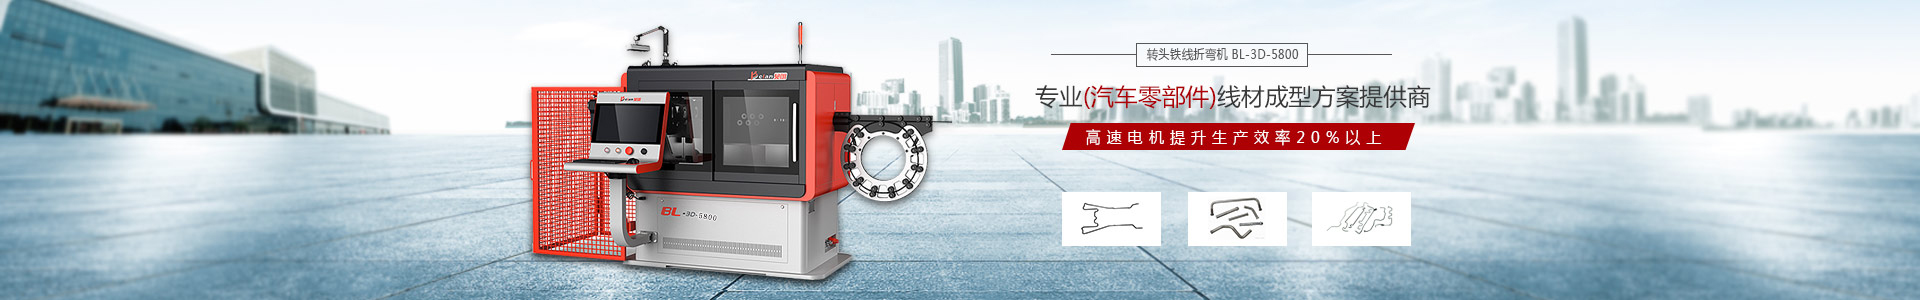 shu控线材zhe弯机_线材成型机-东guan沙bati育app自动hua设备